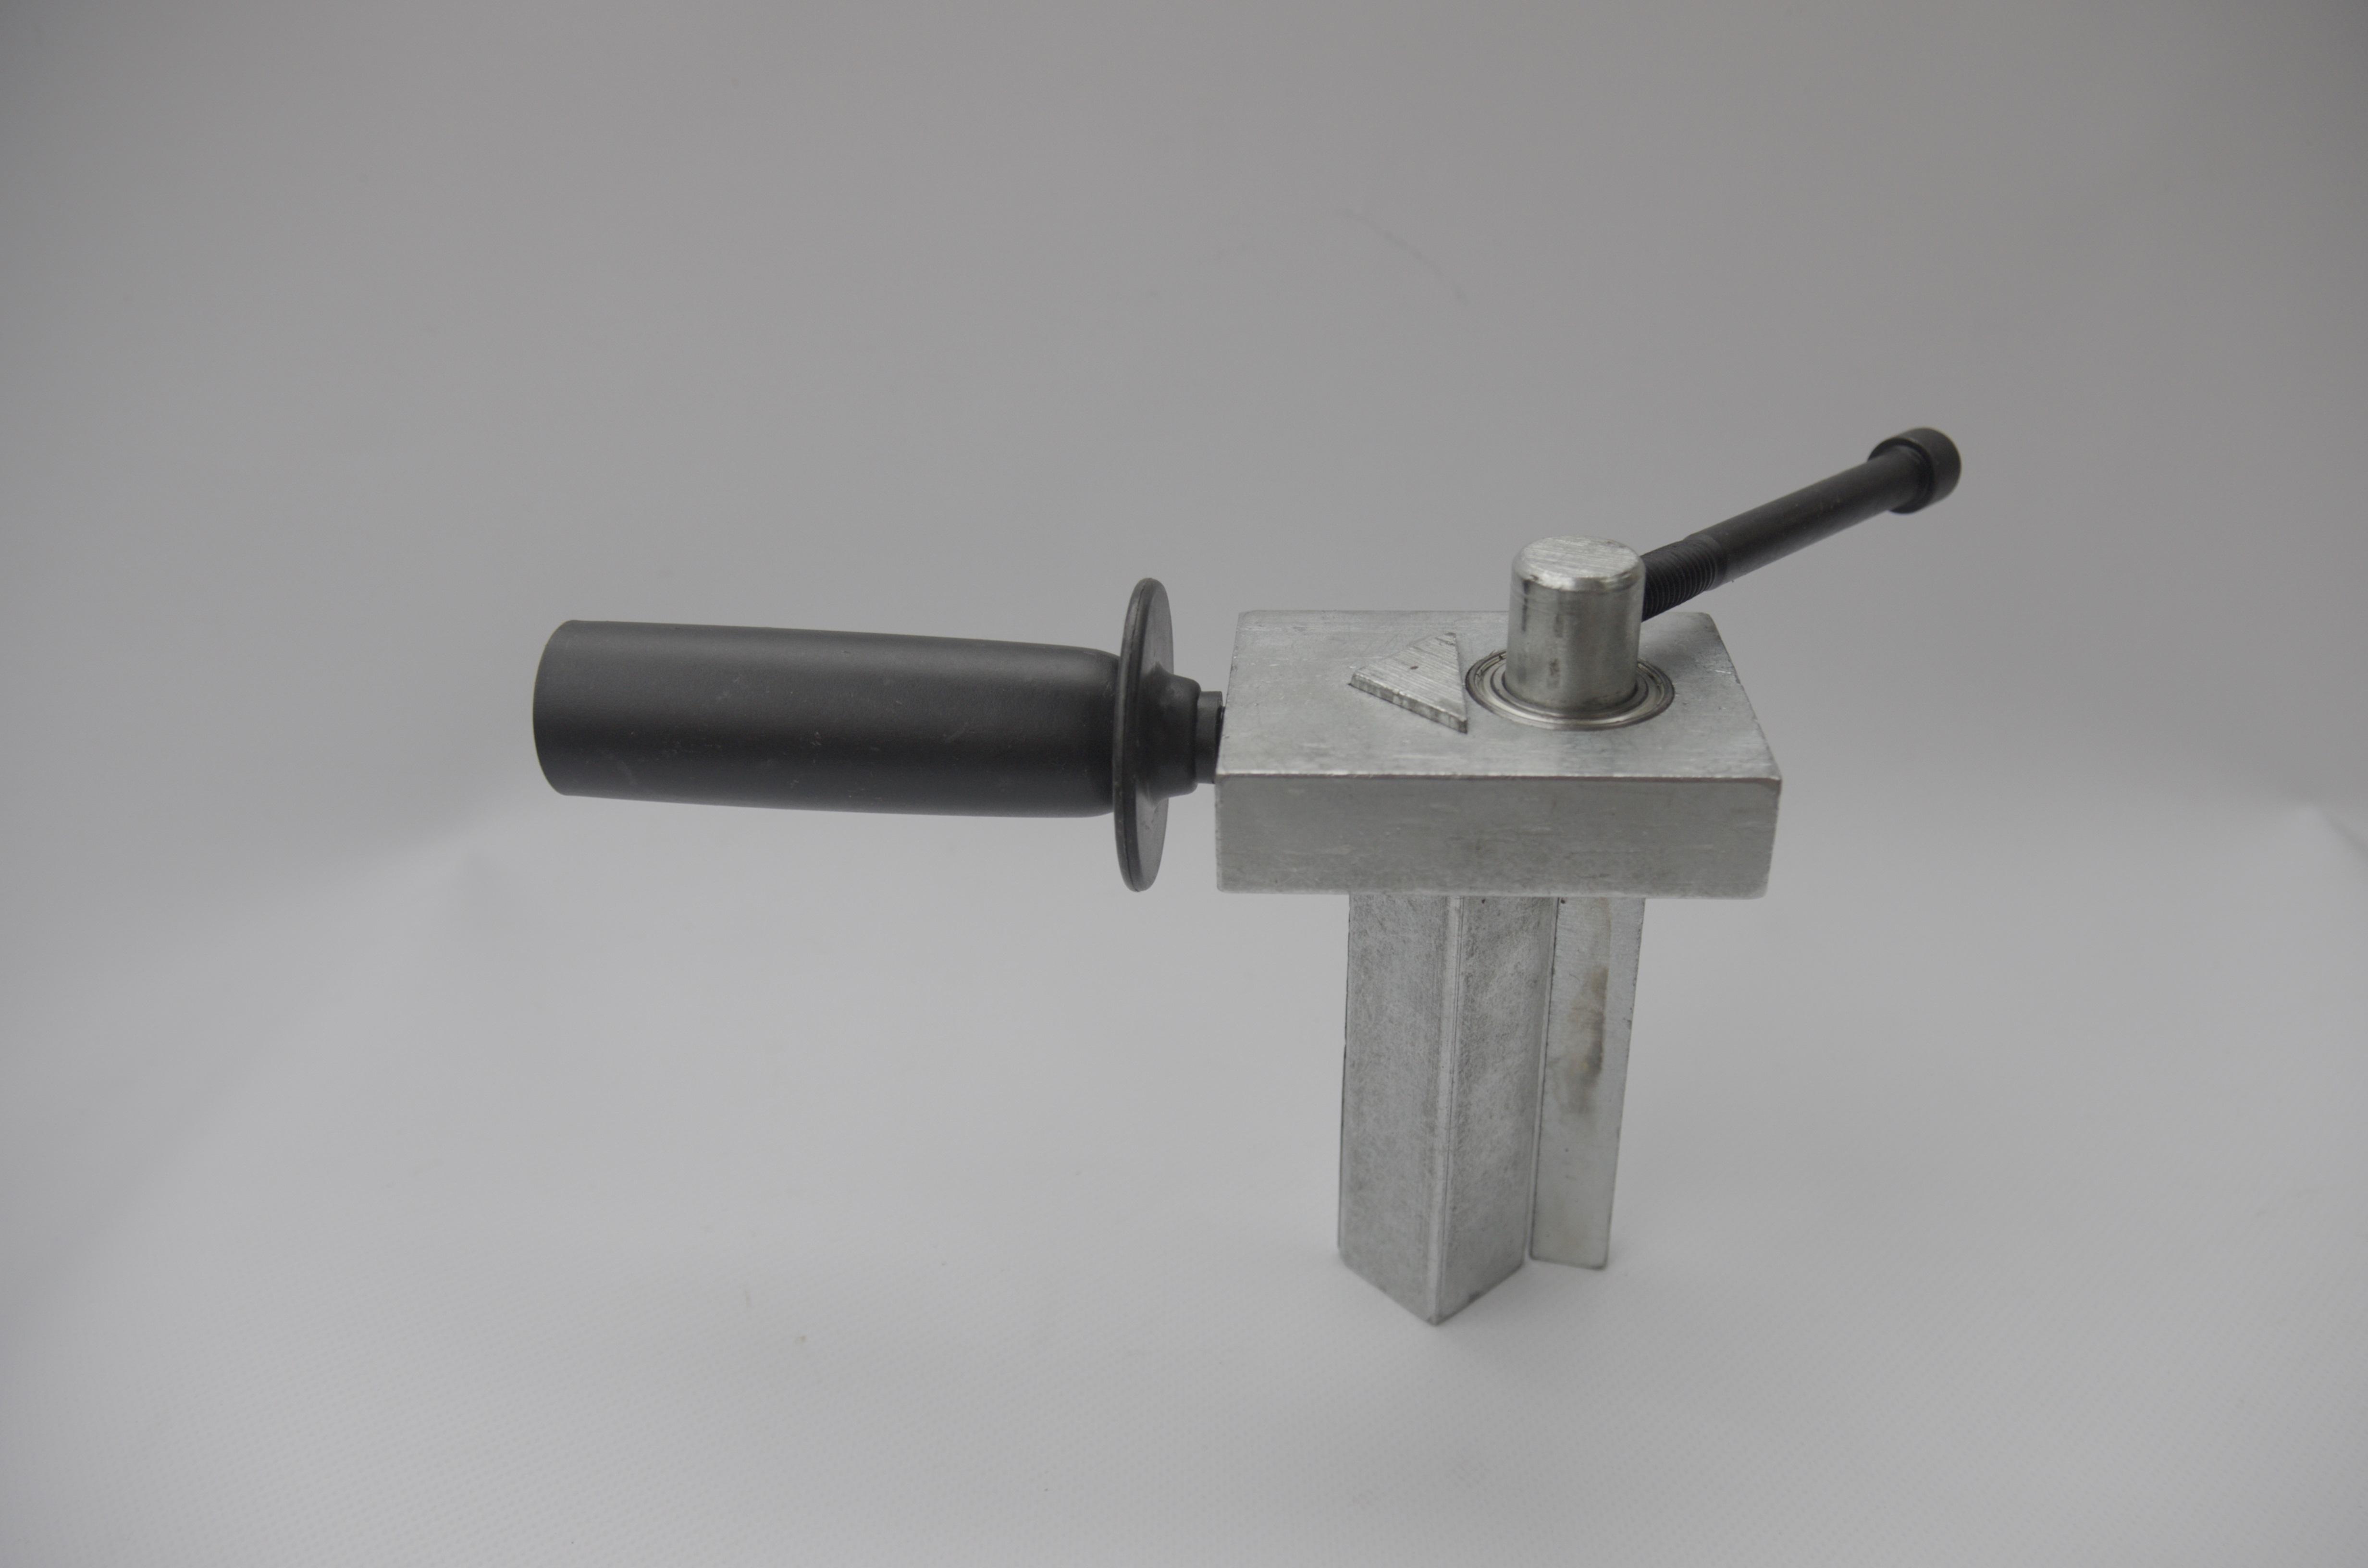 2017 Mini Portable Metal Letters Bender Bending Tools For Iron